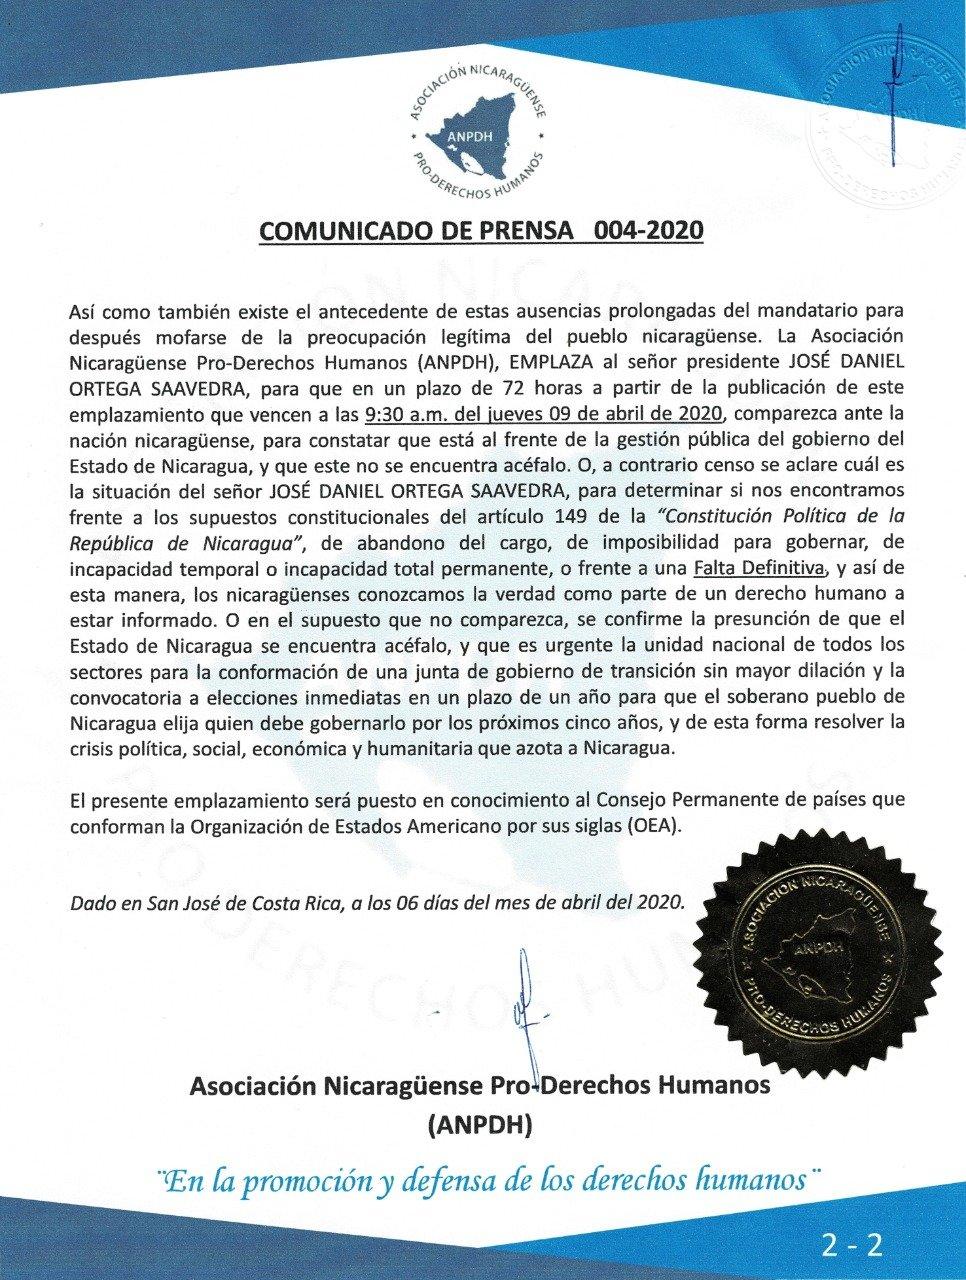 COMUNICADO-DE-PRENSA-04-2020-02